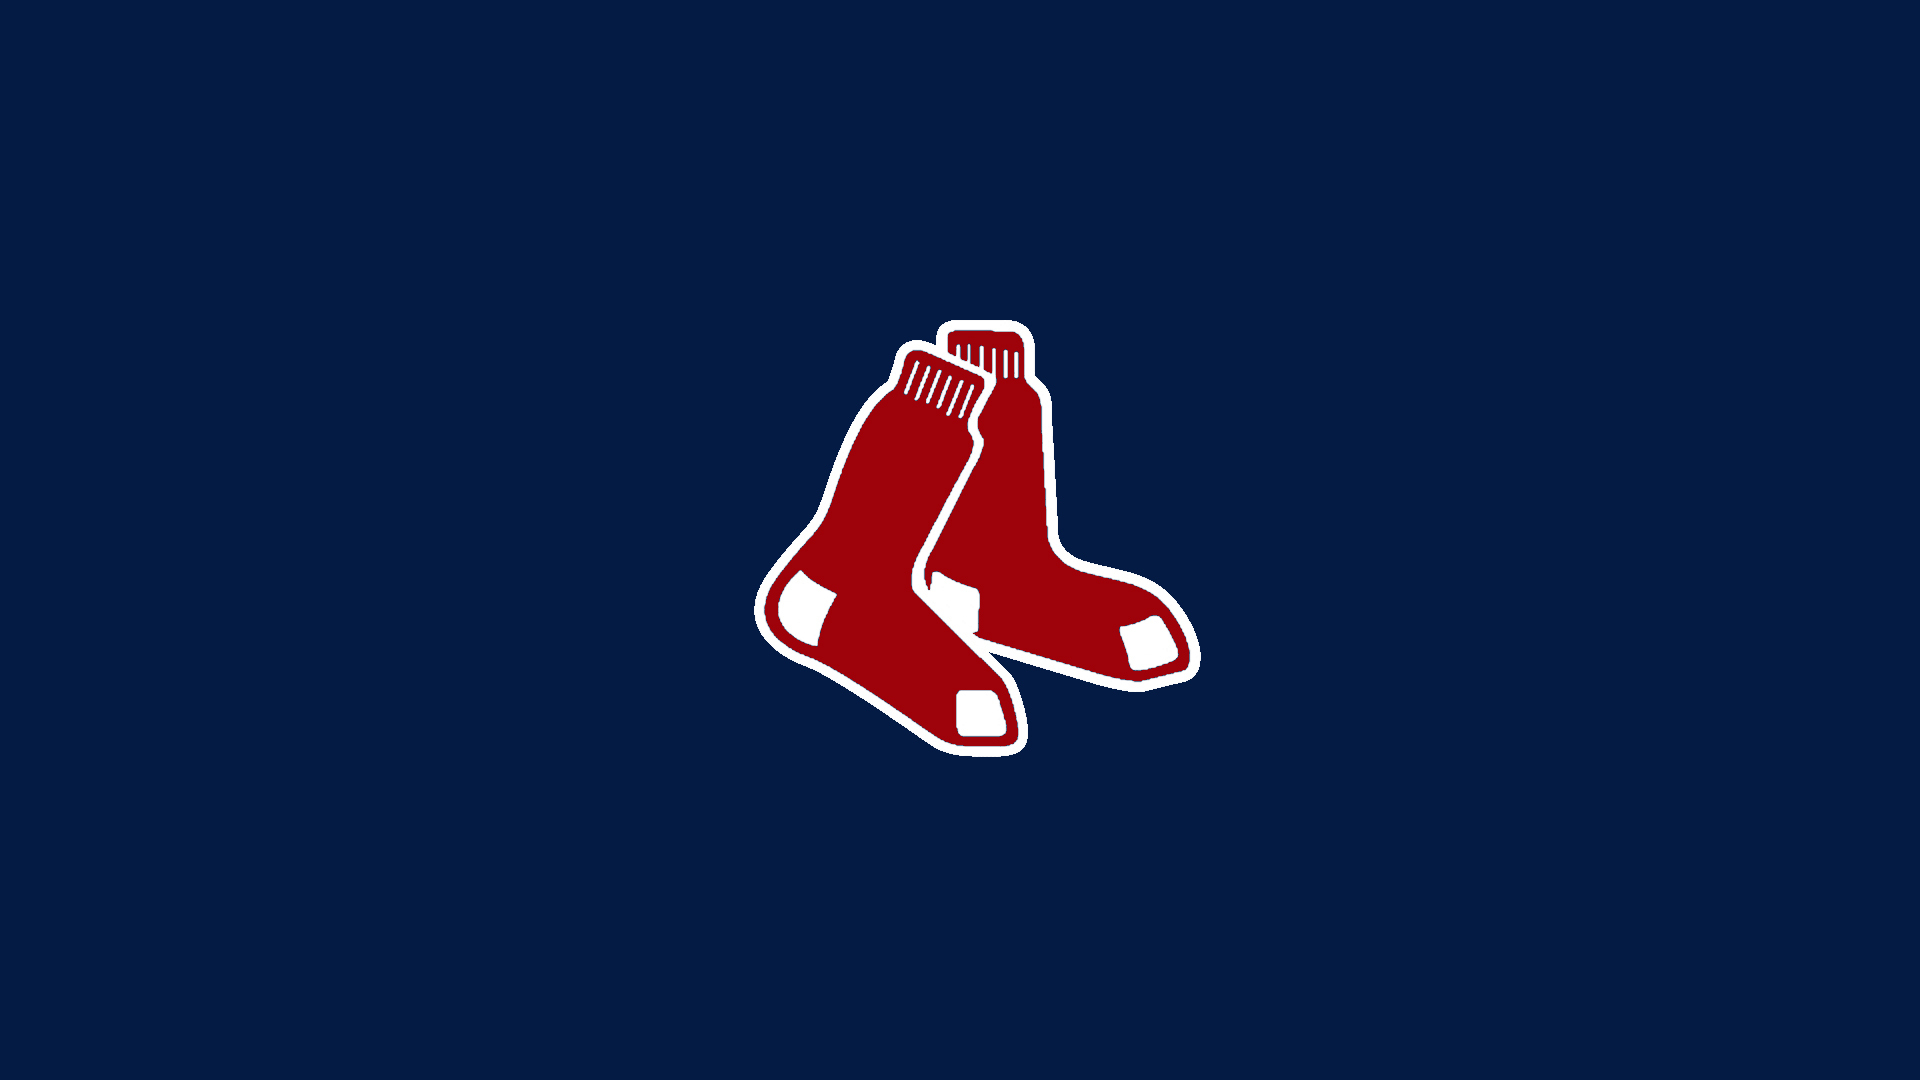 Red Sox Wallpaper 1920x1080   Boston Red Sox Wallpaper 8502581 1920x1080